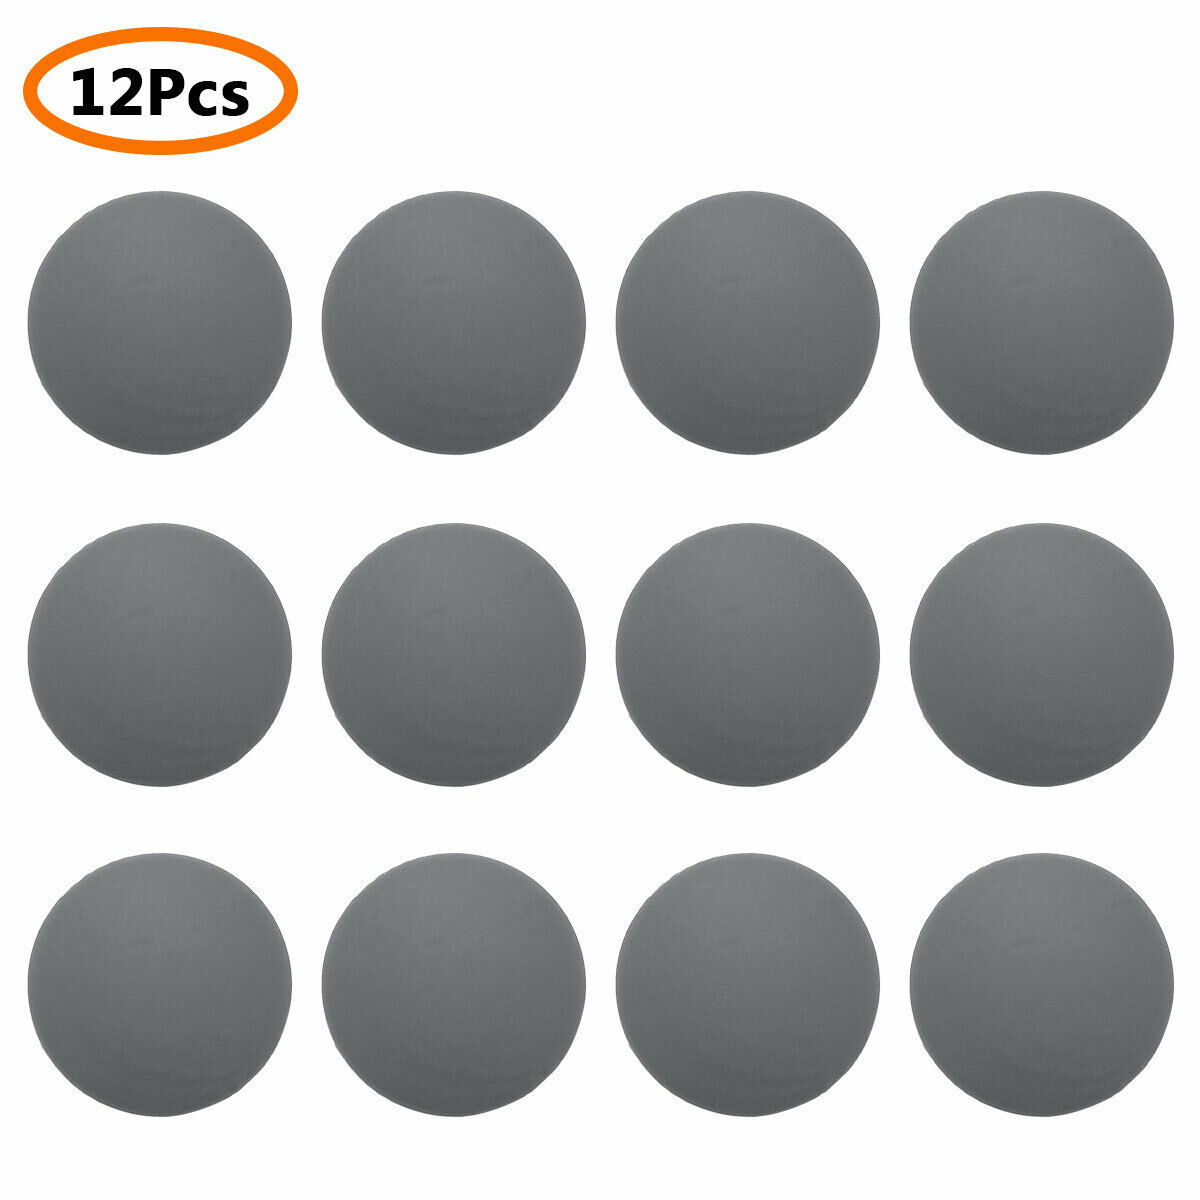 1-100 xtürpuffer 40 mm Door Stopper-Adhesive Rubber Toilet Lid Bump Stop Buffer Stopper